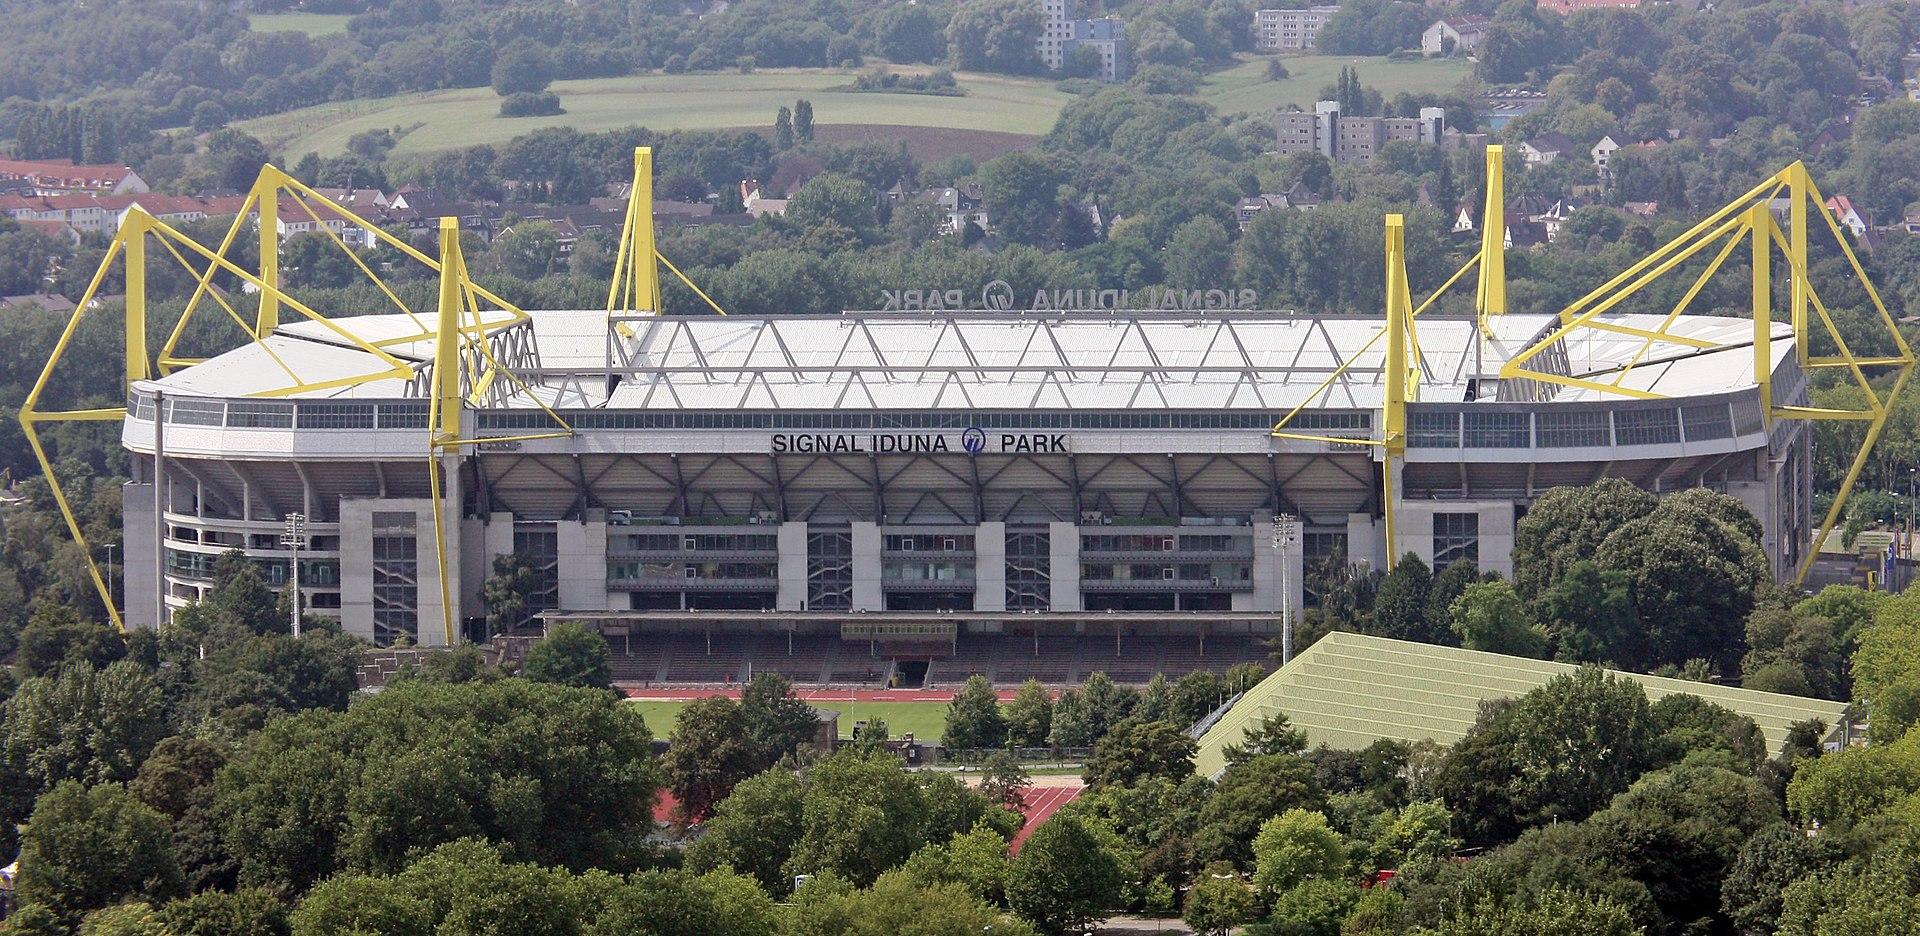 Football Stadiums - Signal Iduna Park, Dortmund